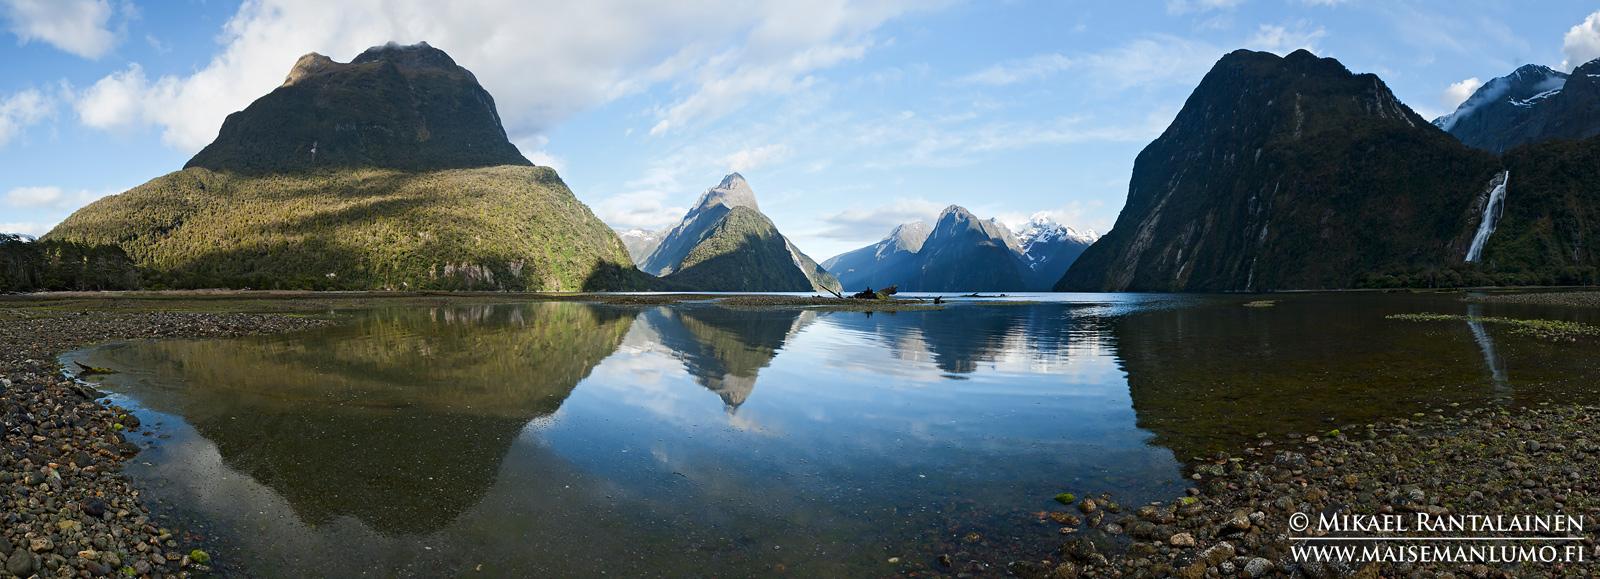 Milford Sound, Uusi-Seelanti (PU104)